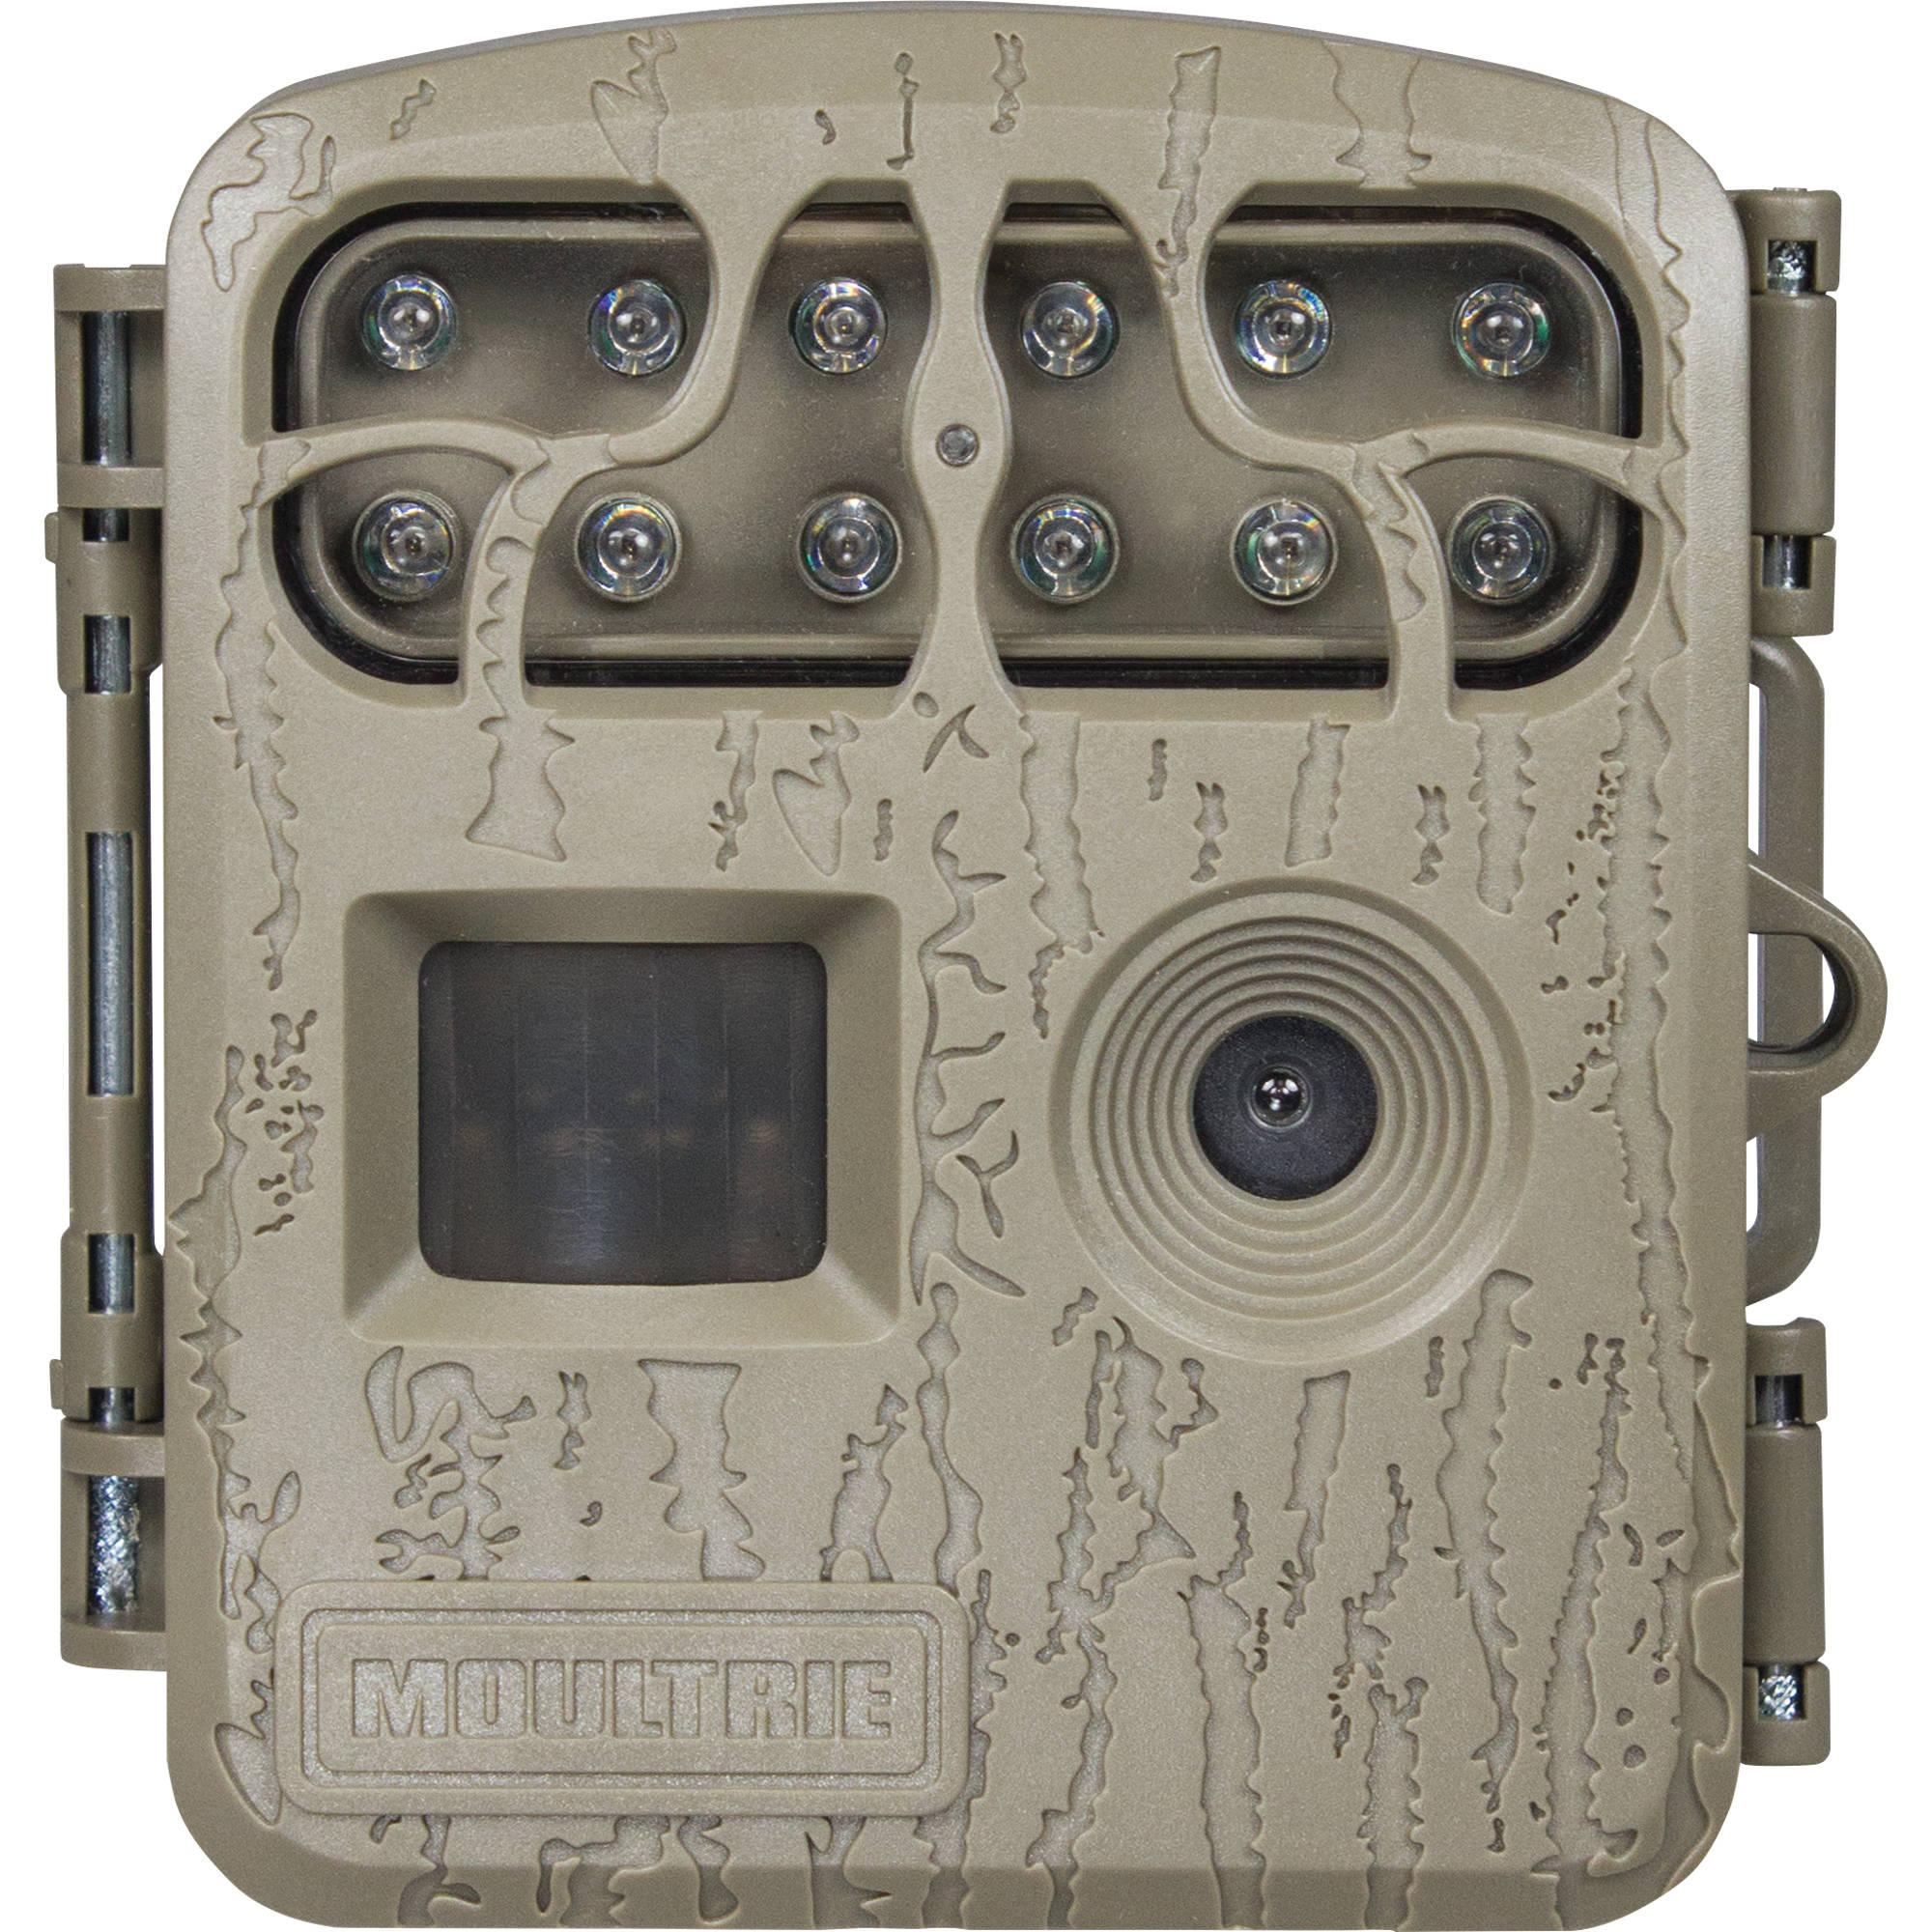 Moultrie Game Spy Micro Digital Trail Camera